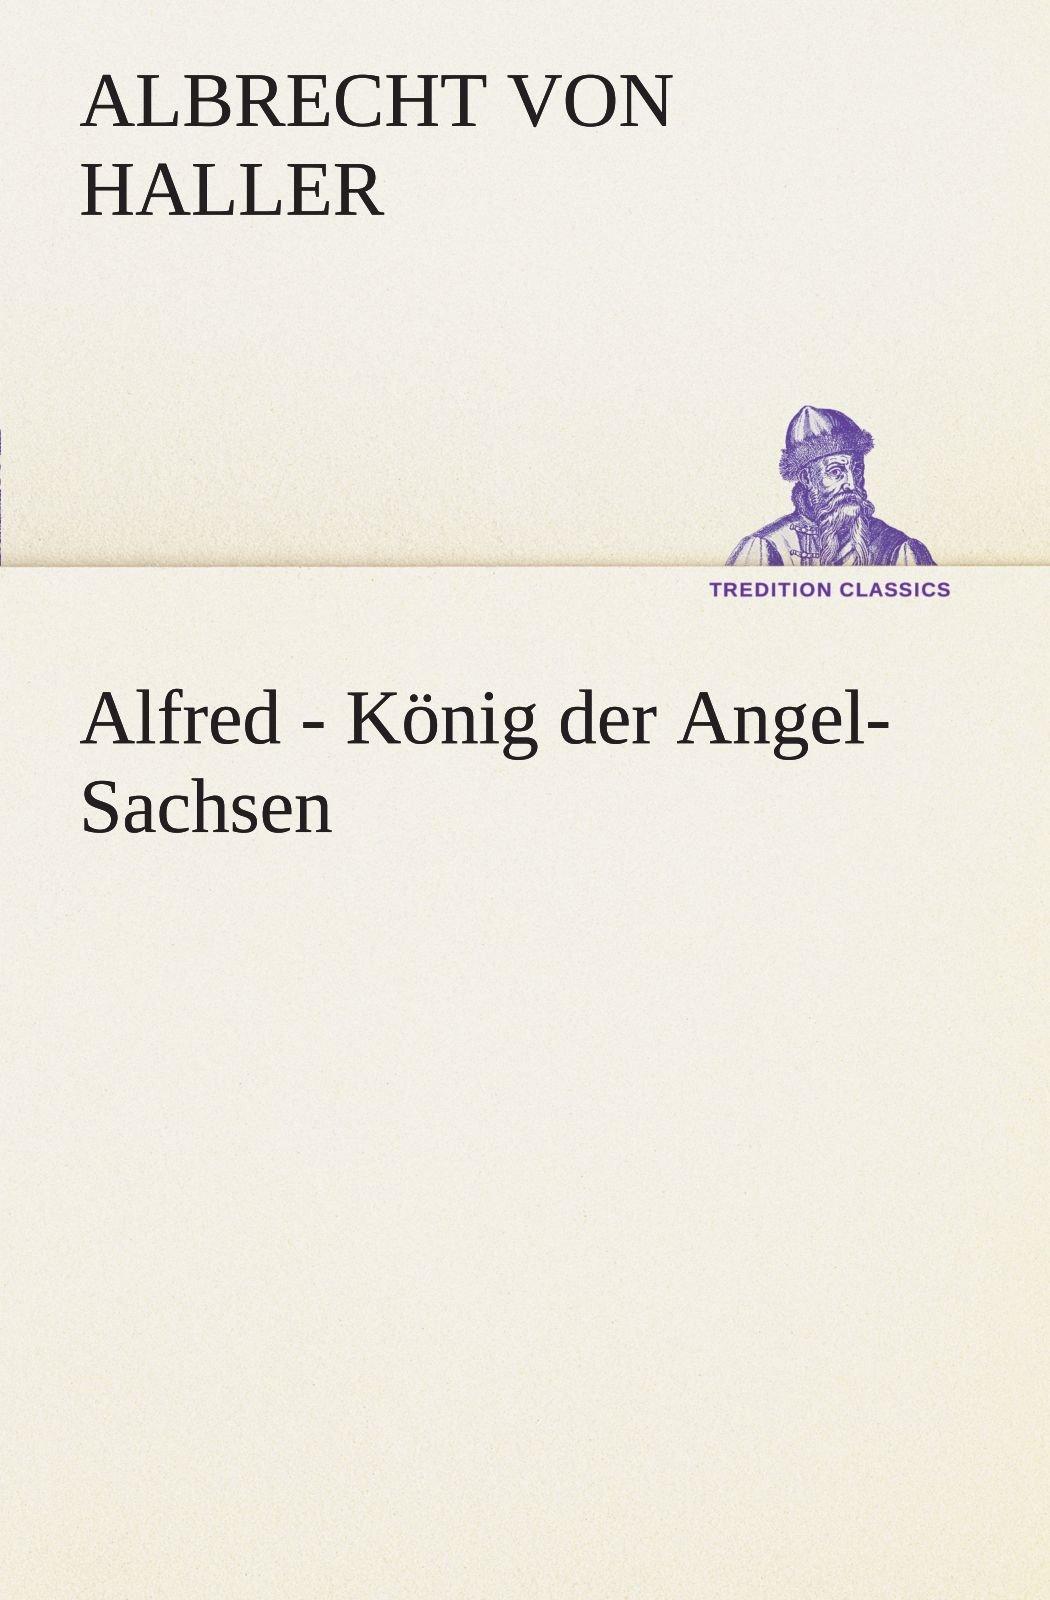 Alfred - König der Angel-Sachsen (TREDITION CLASSICS) (German Edition) ebook